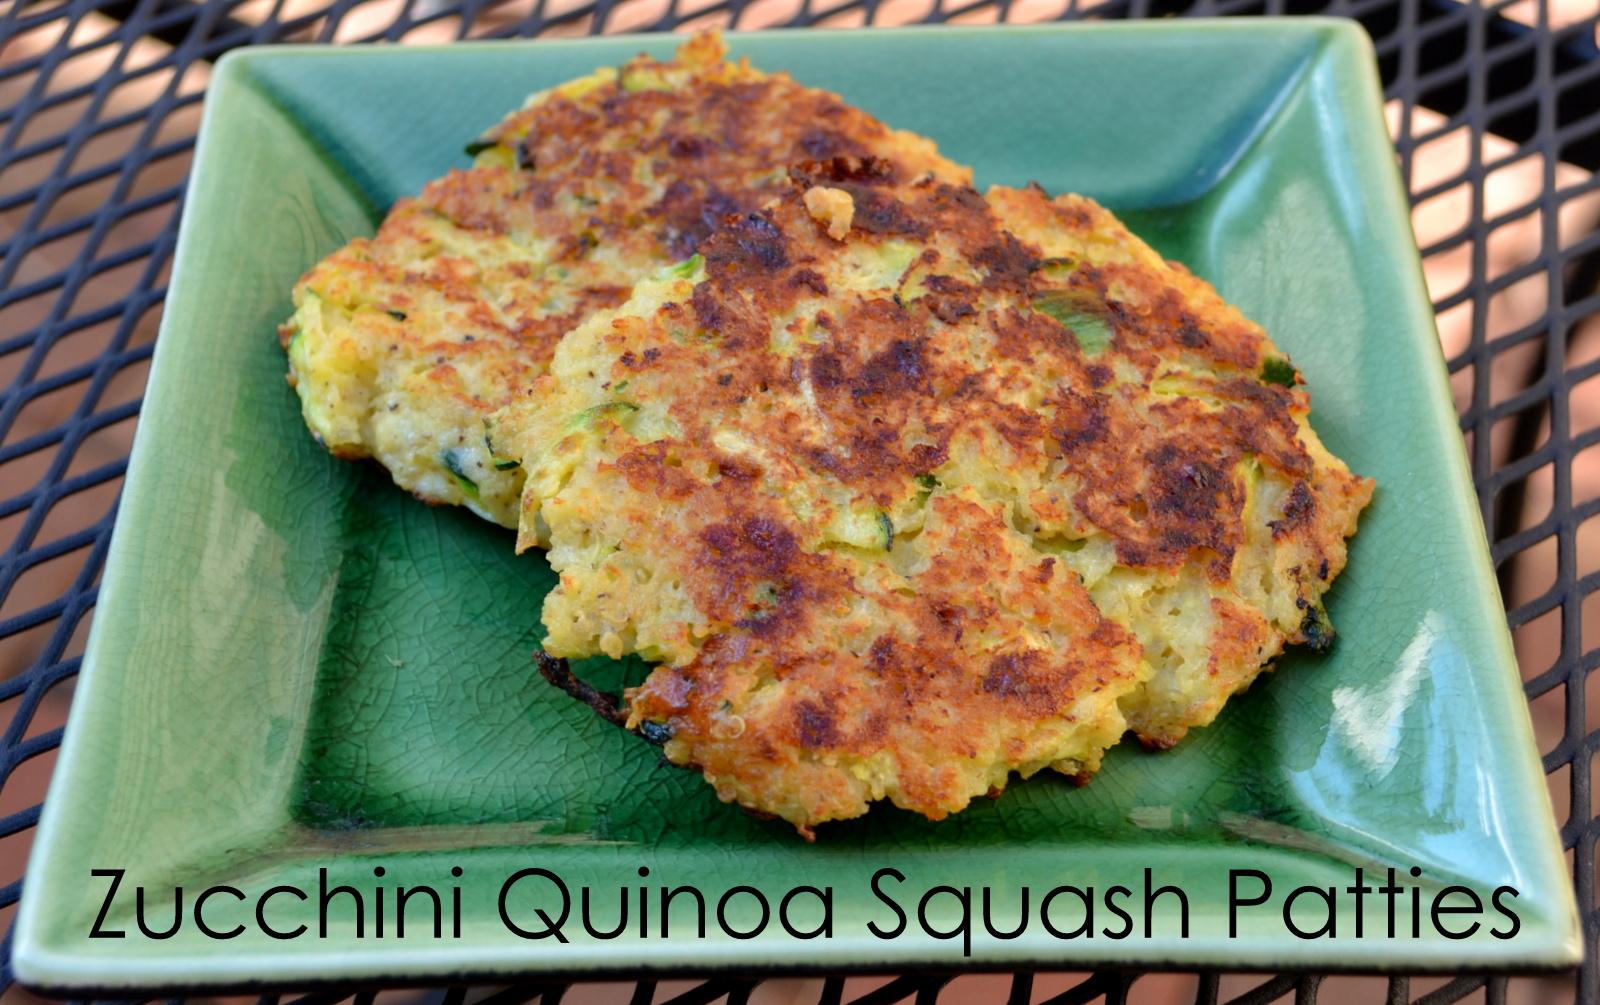 ThriceTheSpice: Zucchini Quinoa Squash Patties